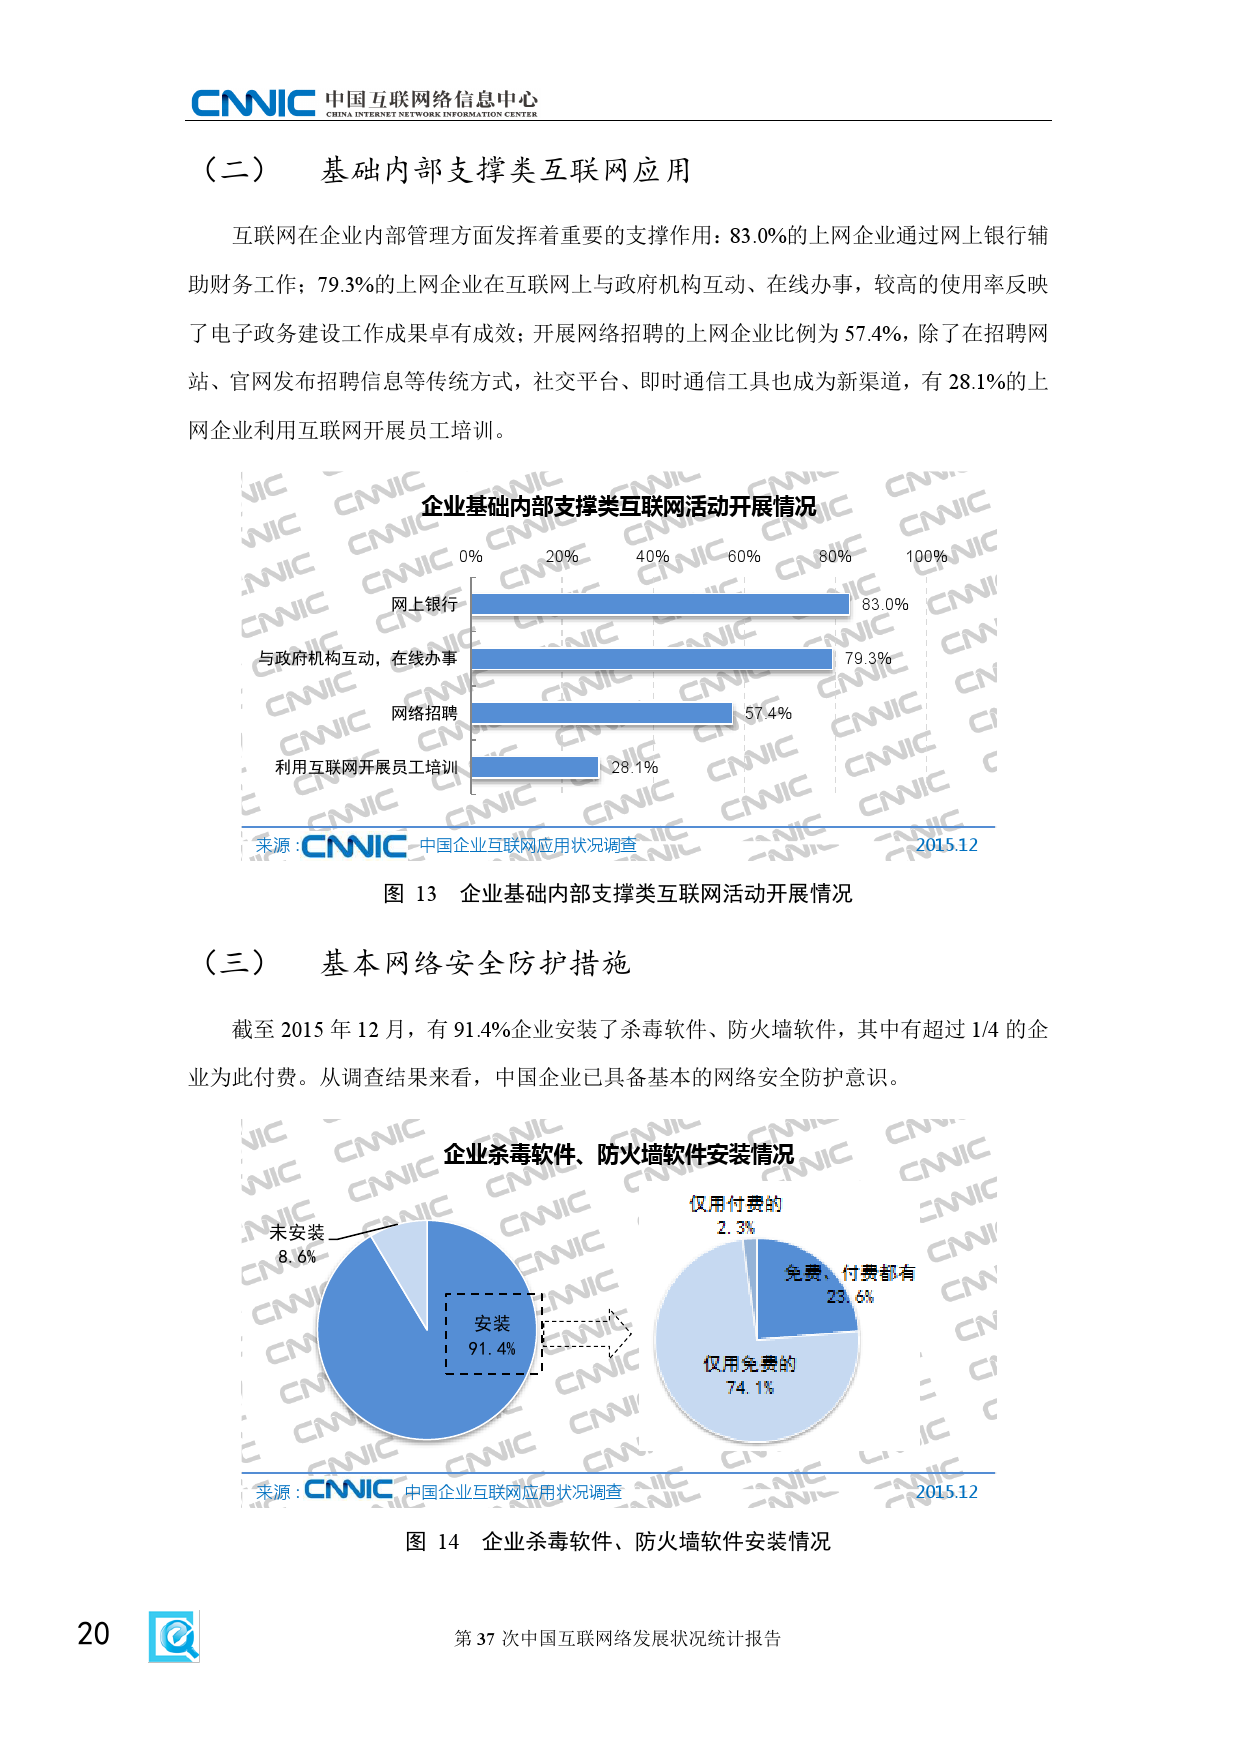 CNNIC:2015年第37次中国互联网络发展状况统计报告_000026